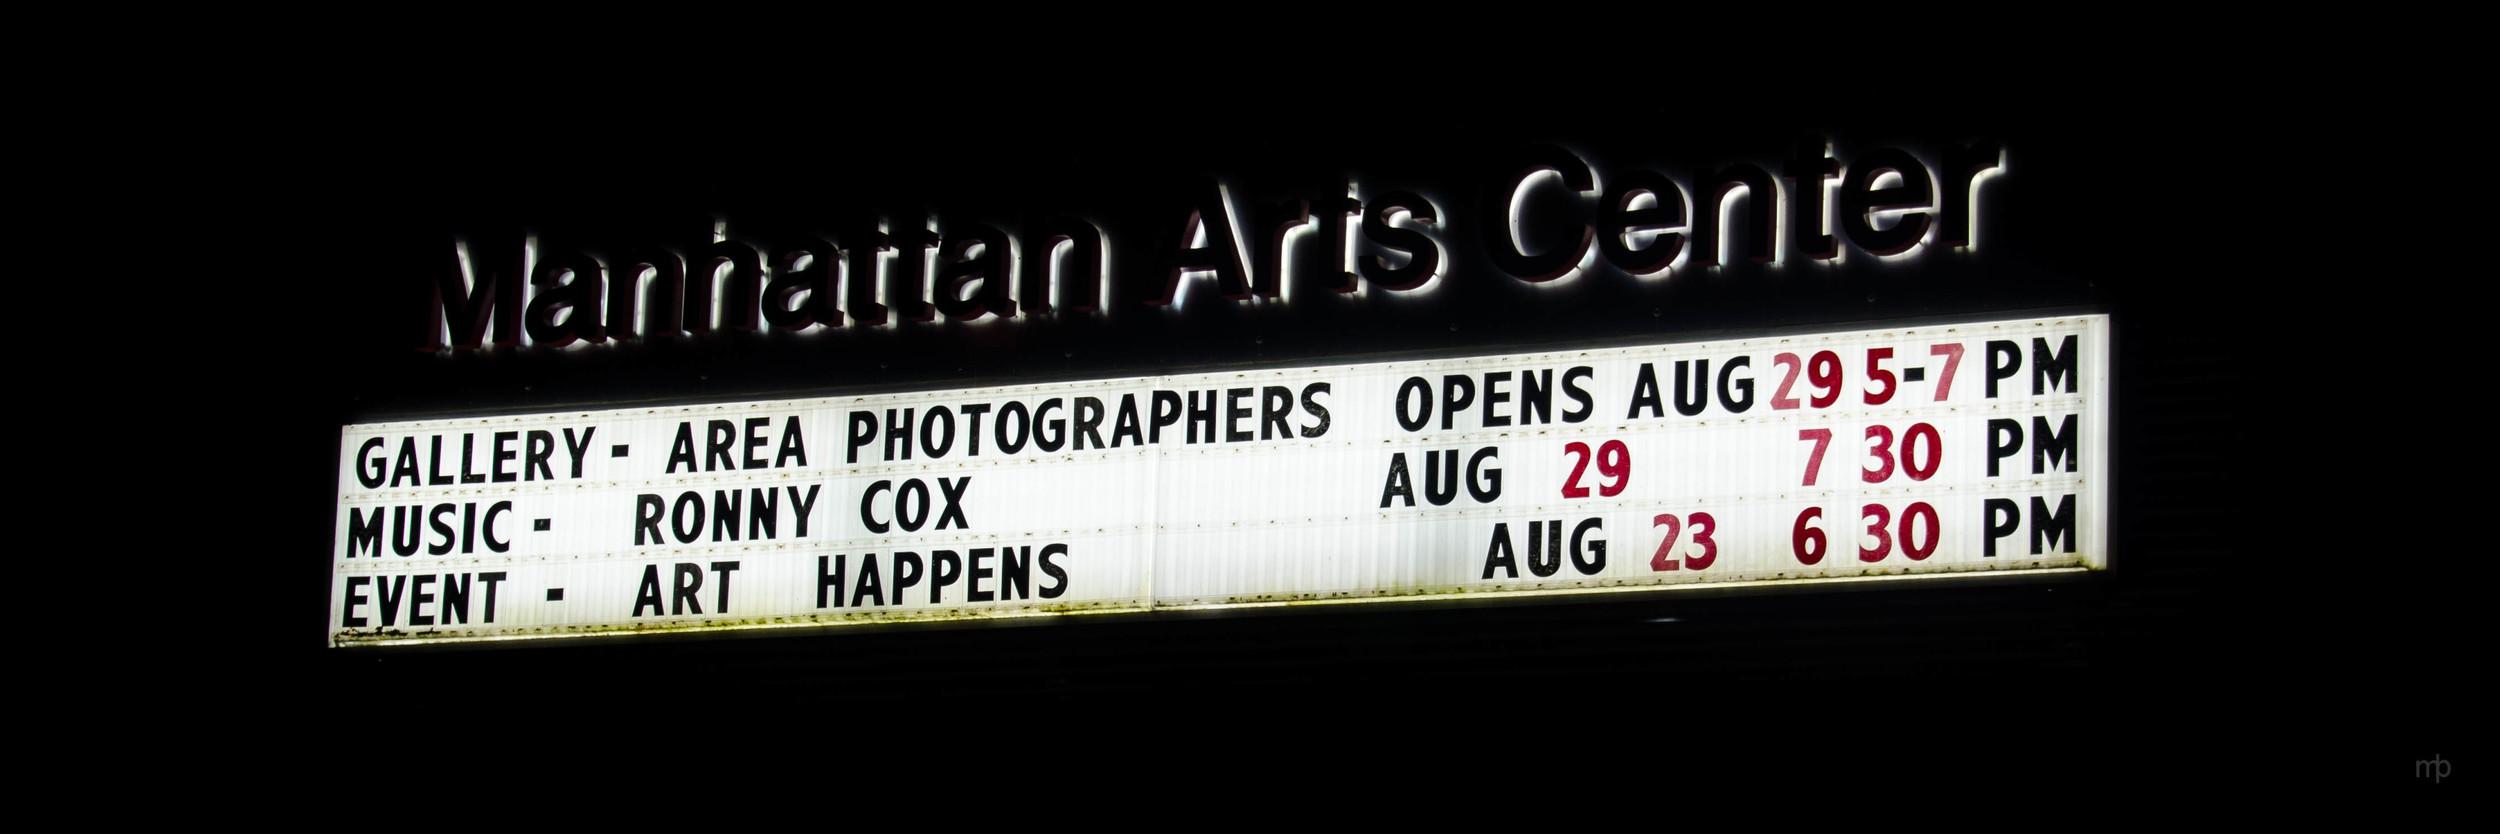 Manhattan Arts Center Sign.